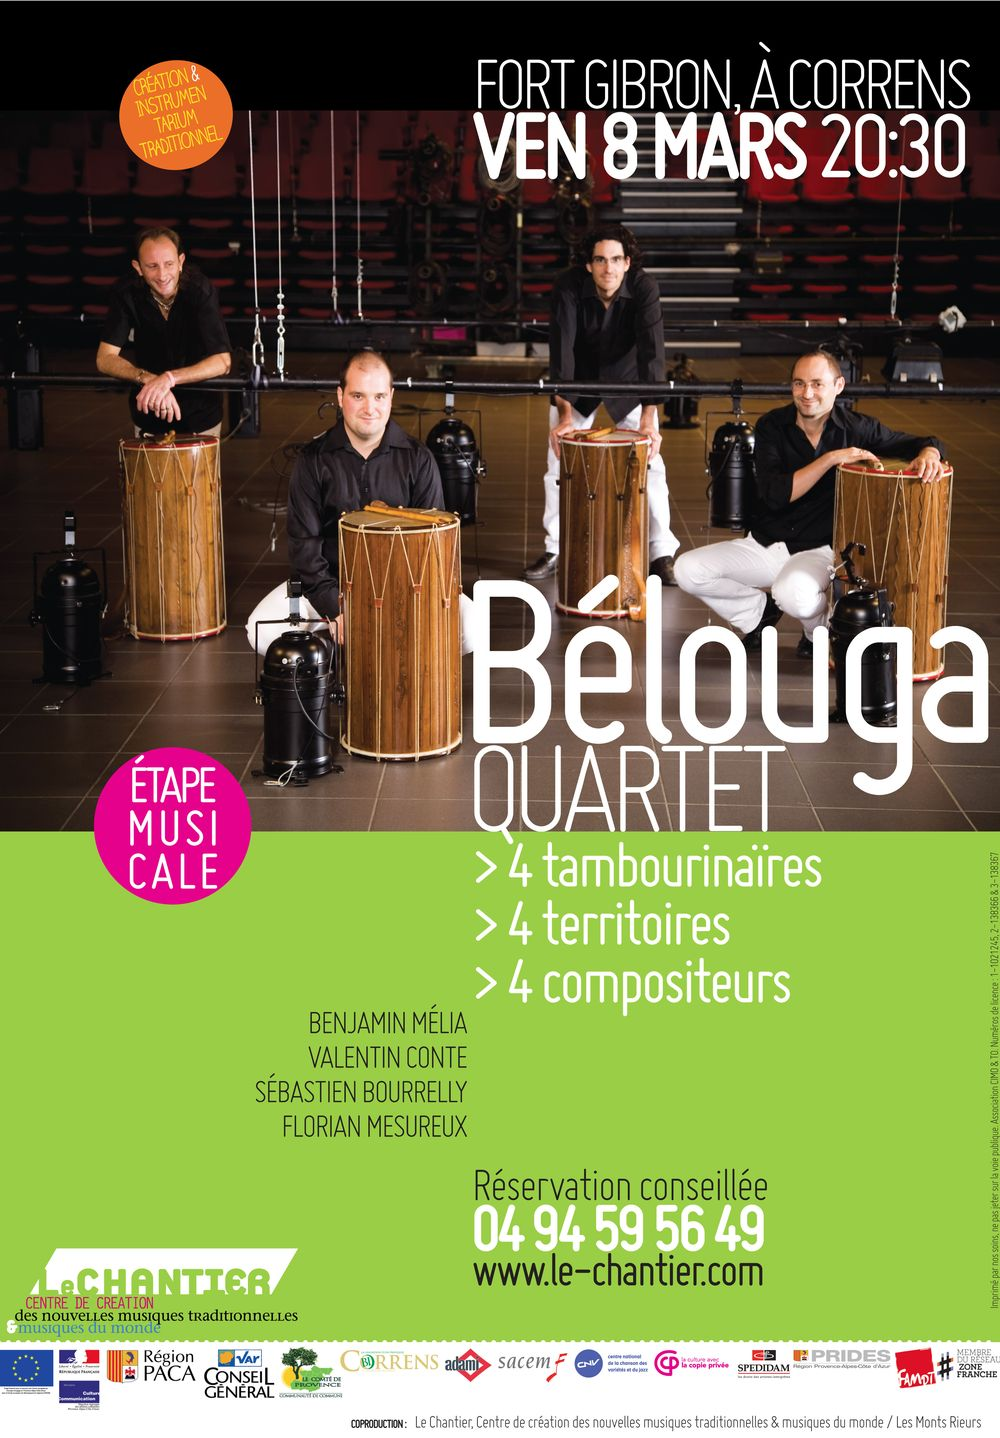 Bélouga Quartet - Étape musicale au Chantier - 8 mars 2013